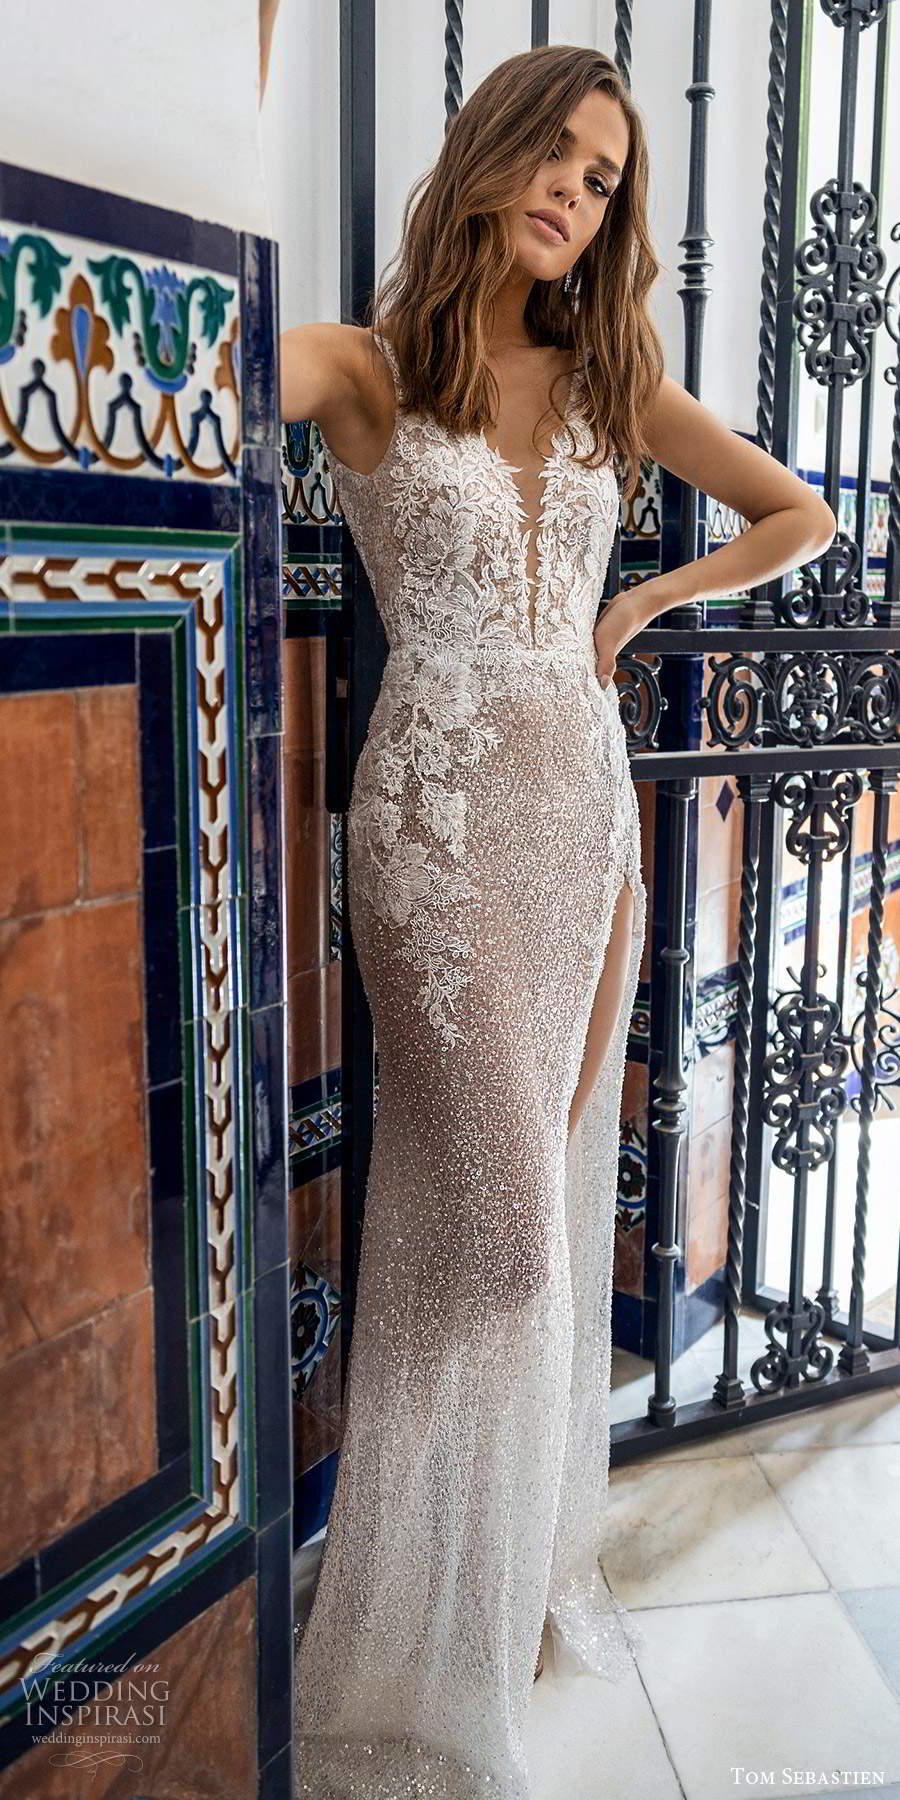 tom sebastien 2021 bridal sleeveless straps plunging v neckline fully embellished sheath wedding dress slit skirt sweep train (17) mv